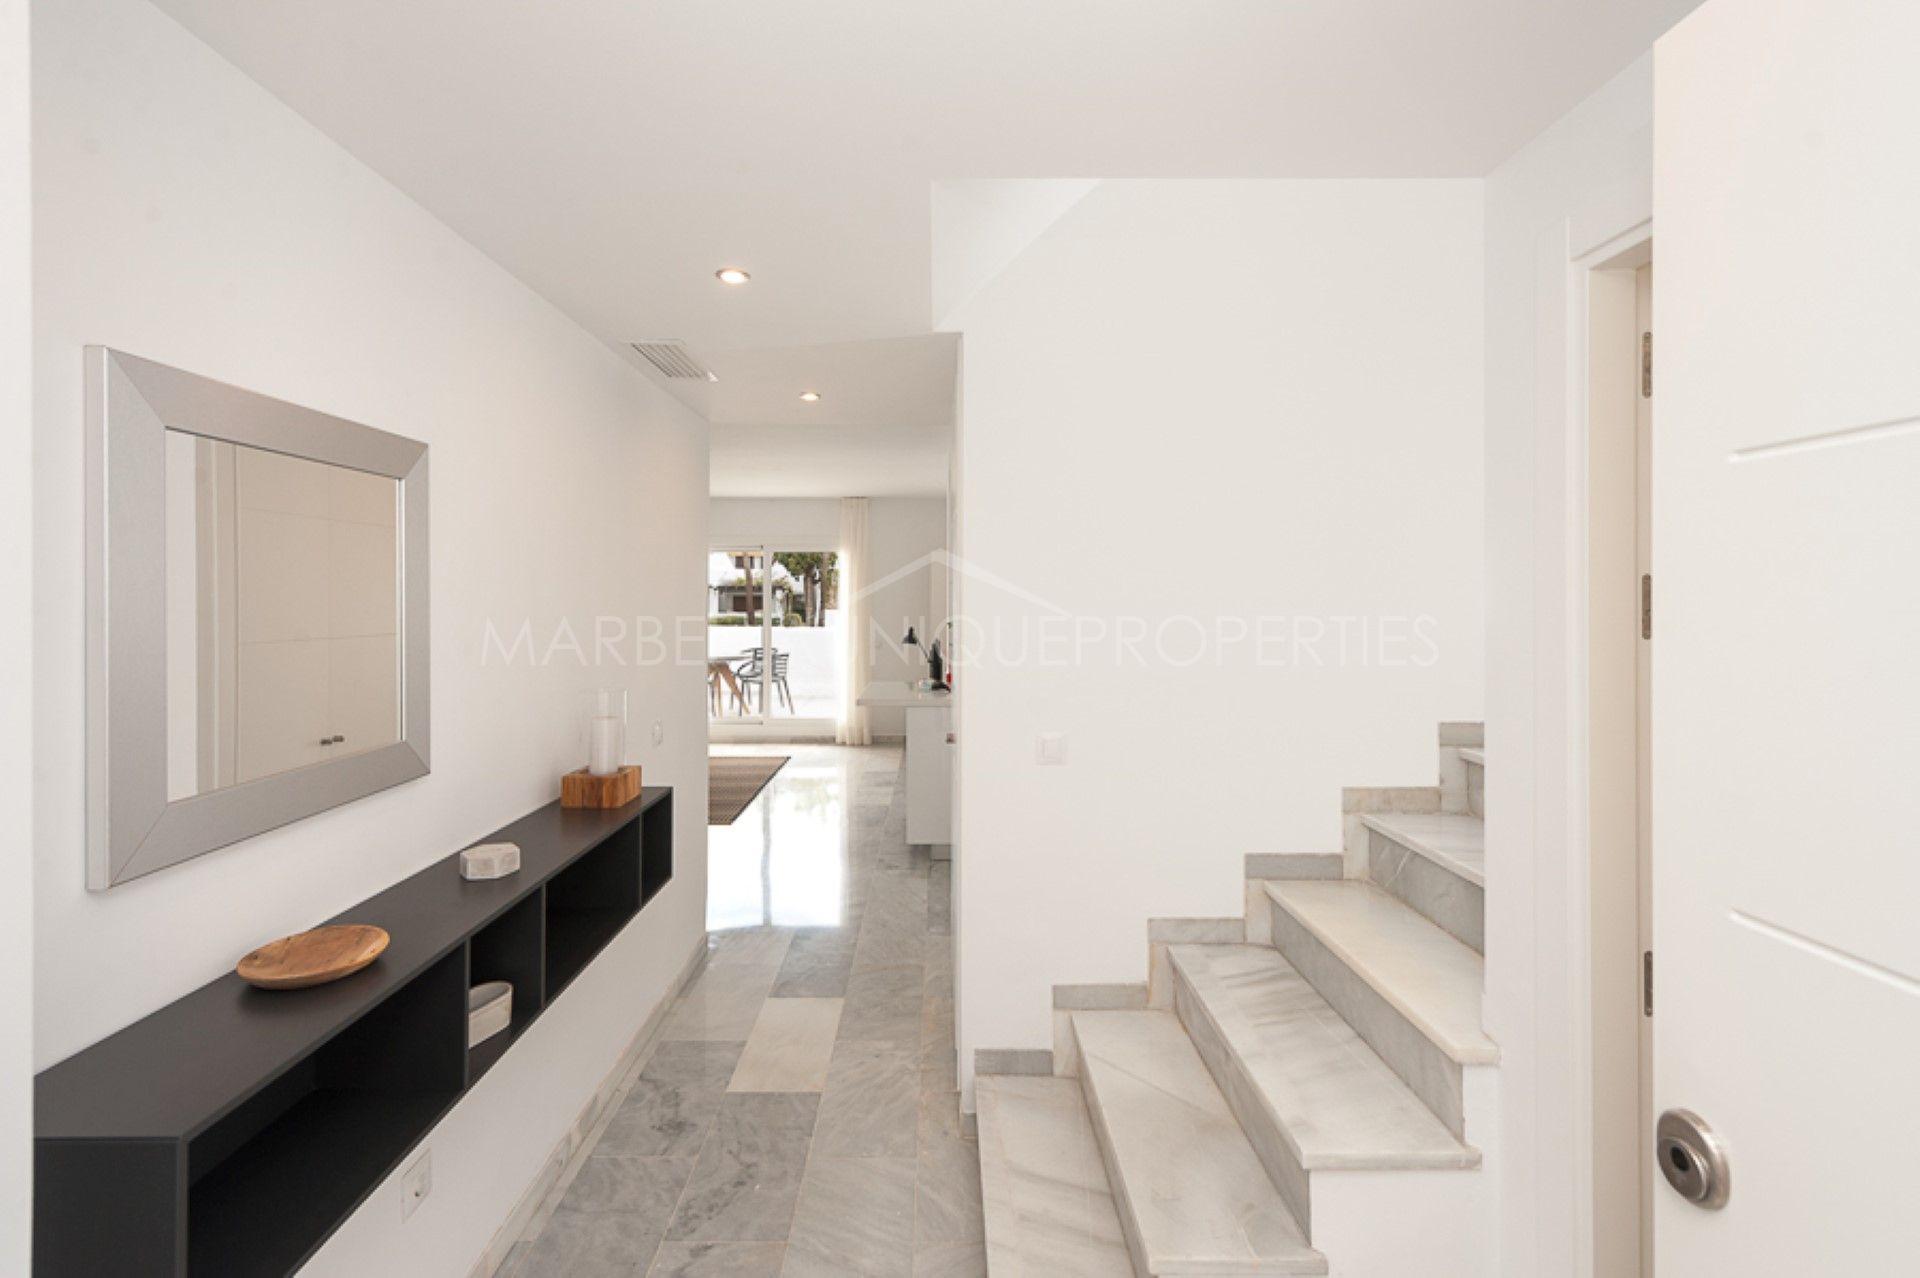 appartement rez de chauss e en vente nueva andalucia marbella. Black Bedroom Furniture Sets. Home Design Ideas